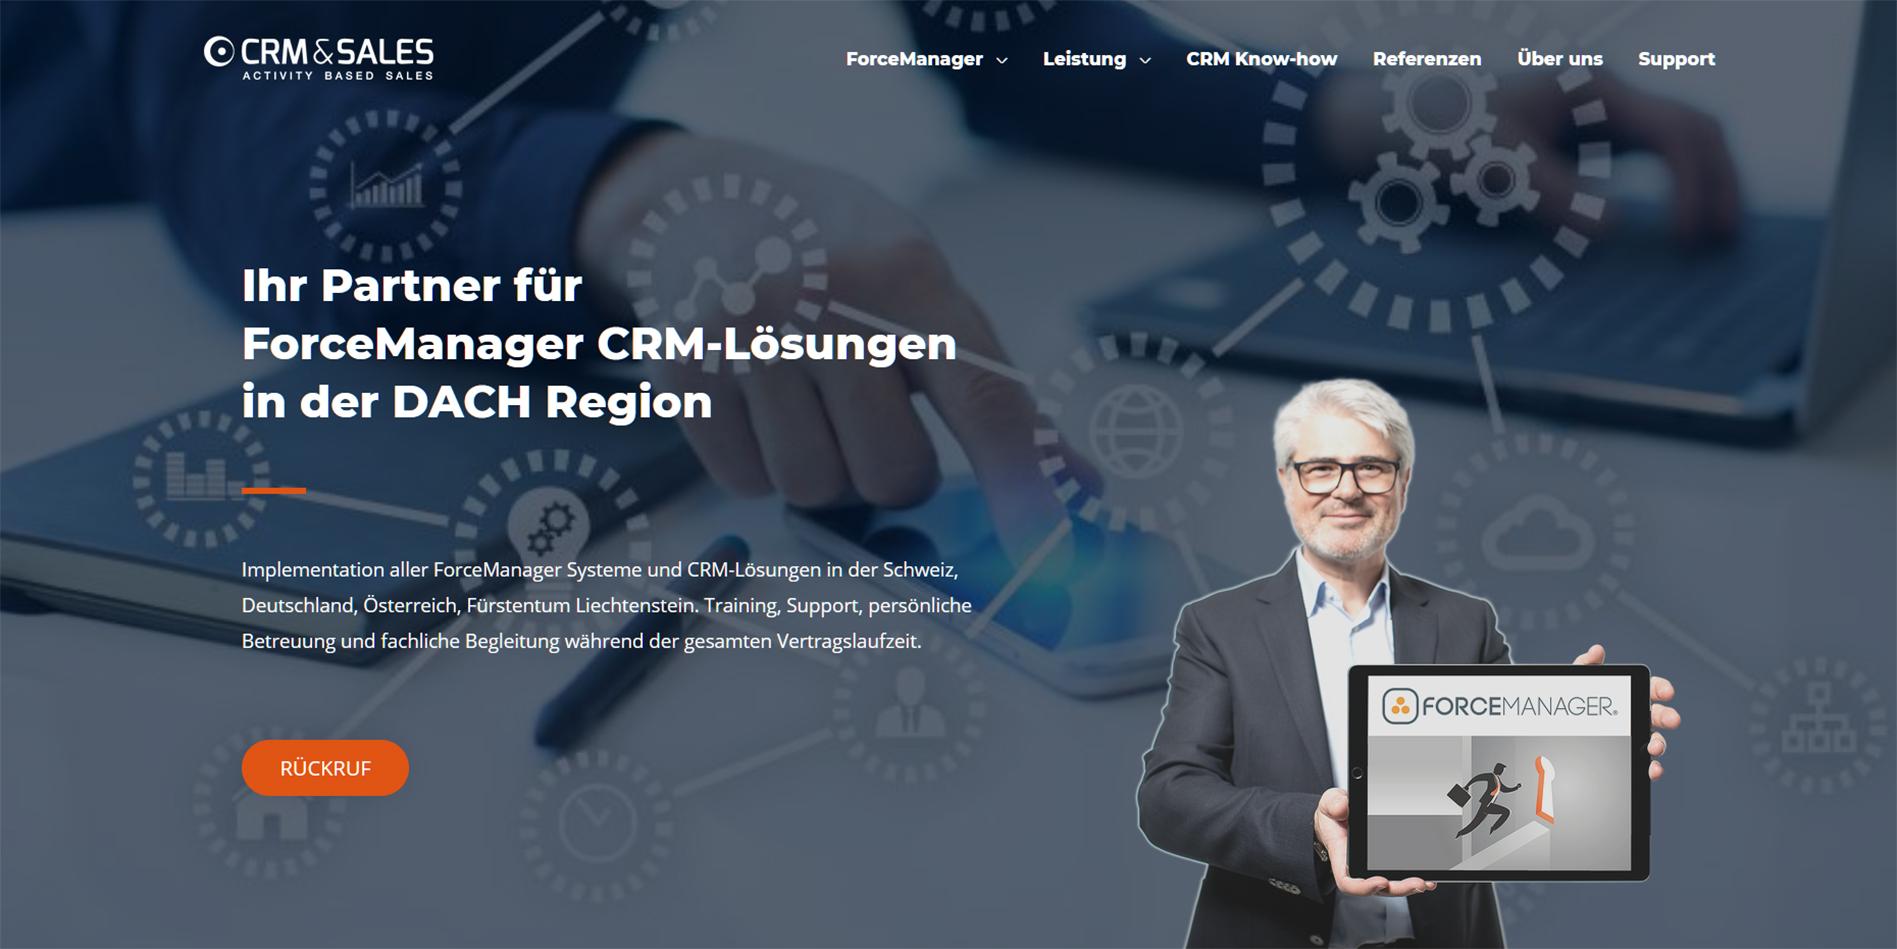 Website CRM&SALES